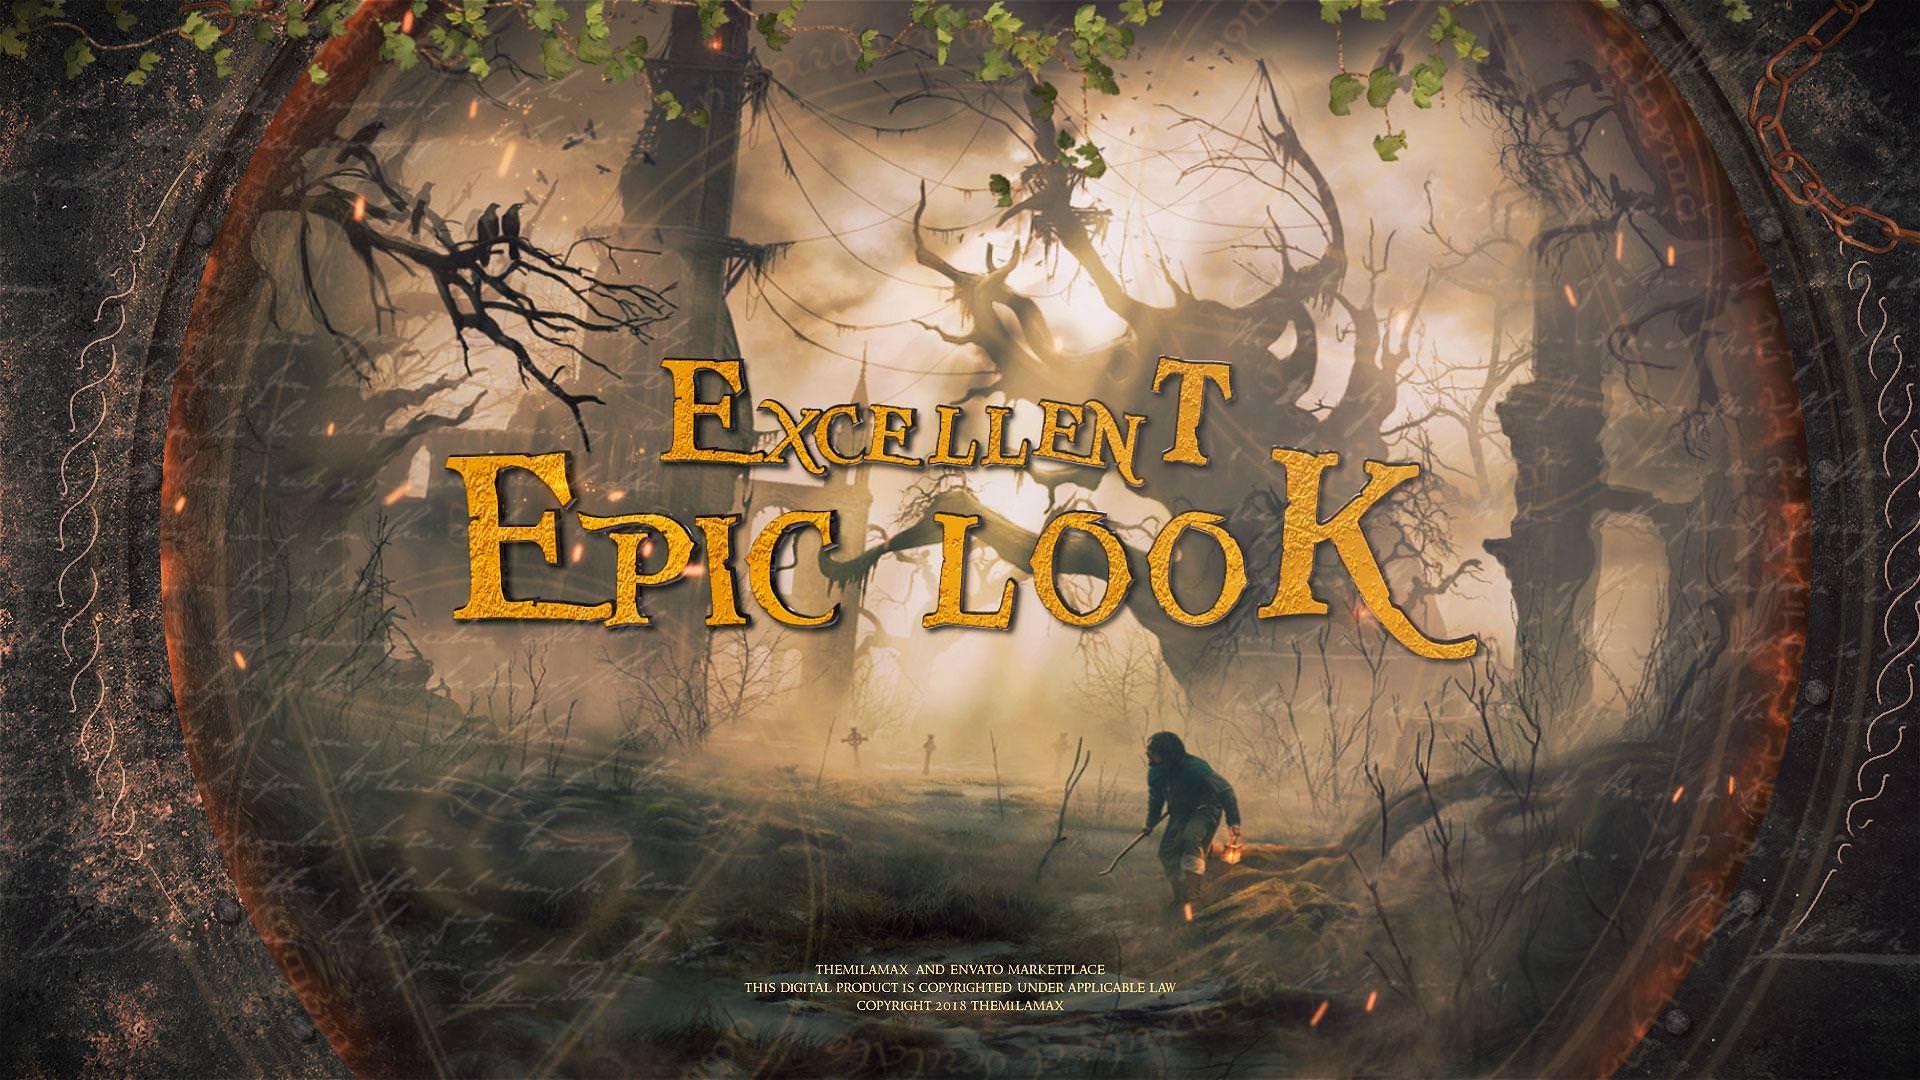 Fantasy Trailer 2 - 10